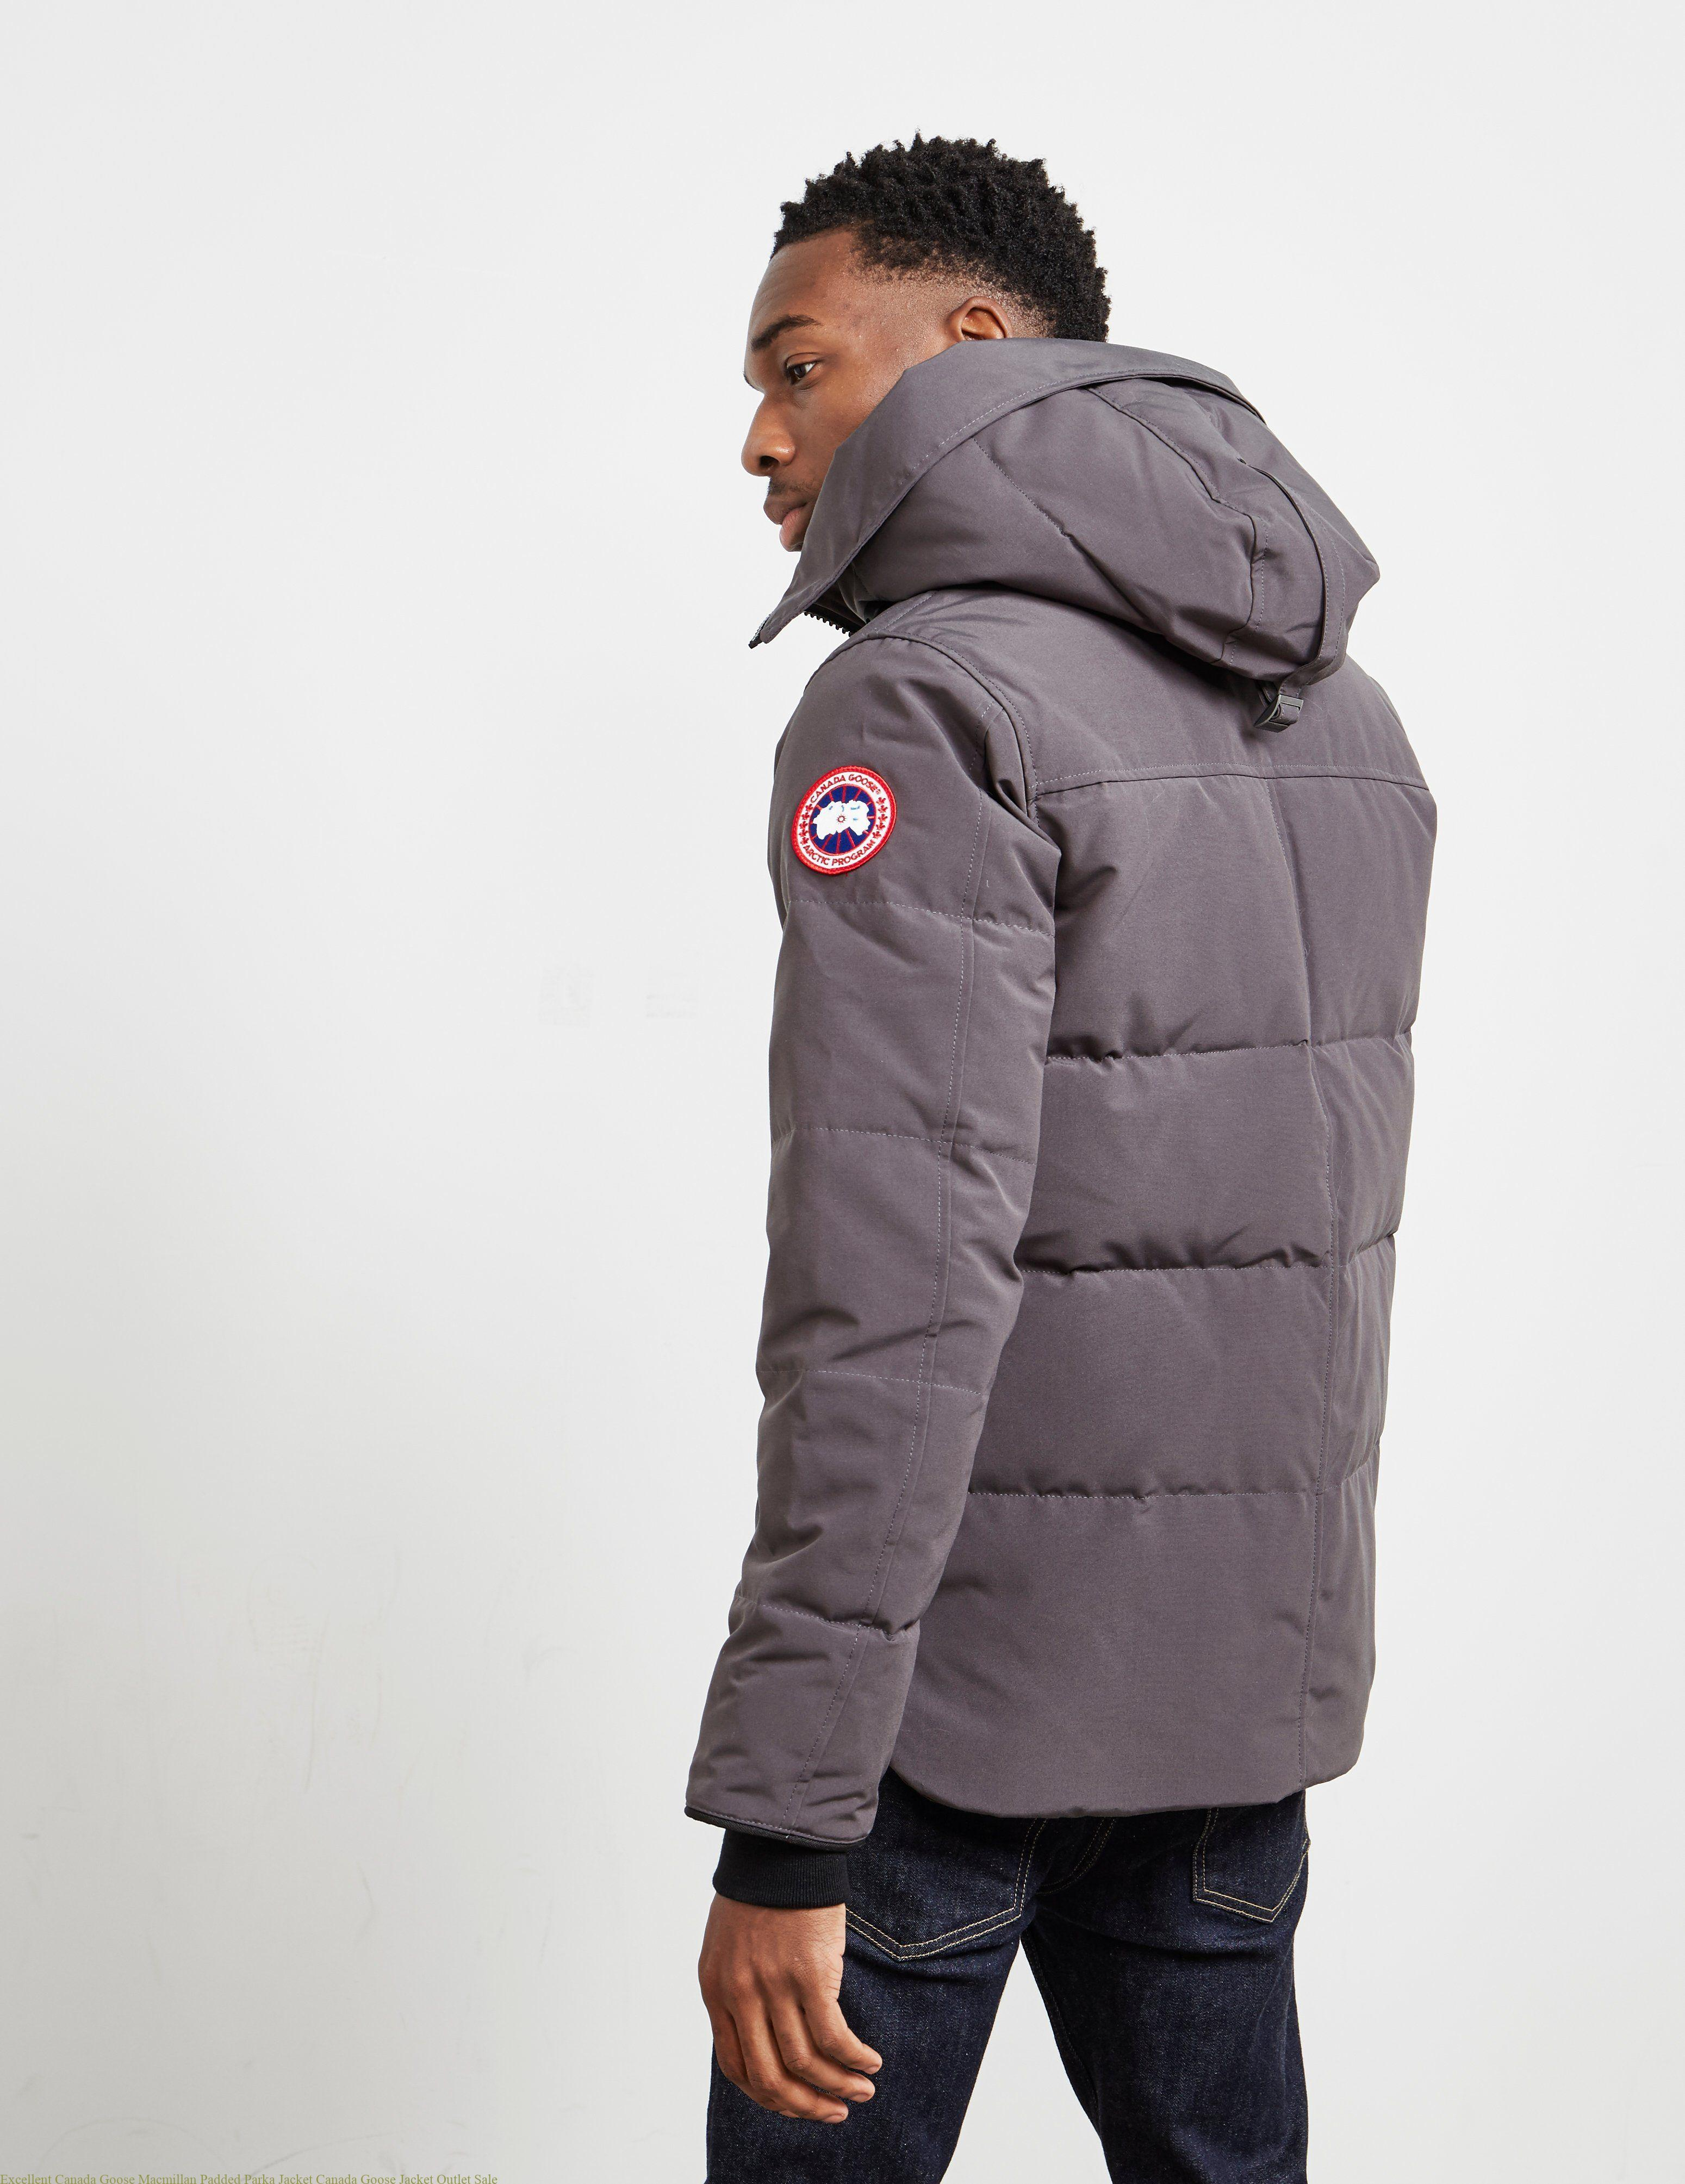 070d0bd04c1 Excellent Canada Goose Macmillan Padded Parka Jacket Canada Goose Jacket  Outlet Sale